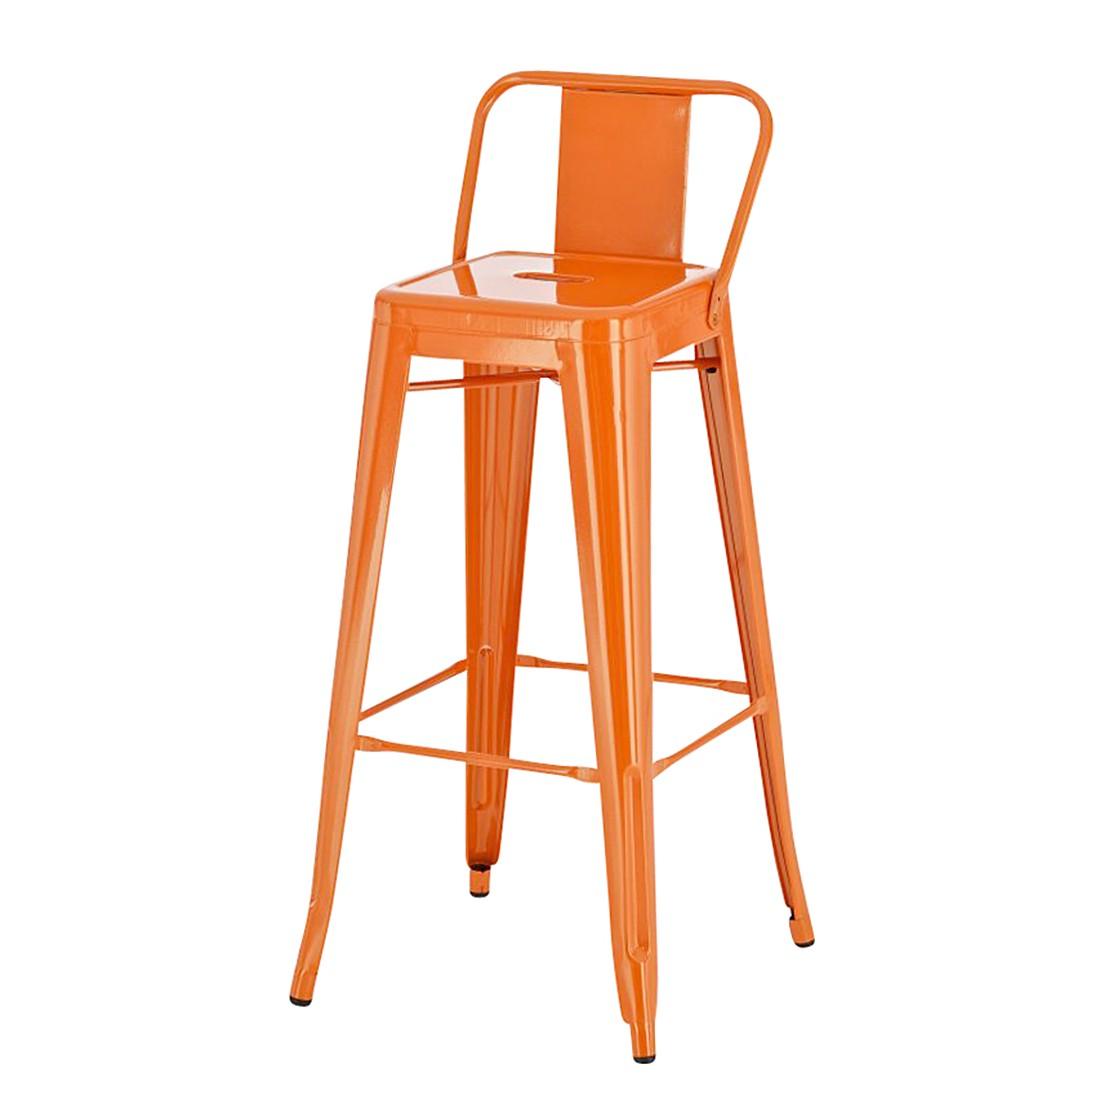 Barhocker Mason – Orange – Metall Lackiert, furnlab günstig kaufen